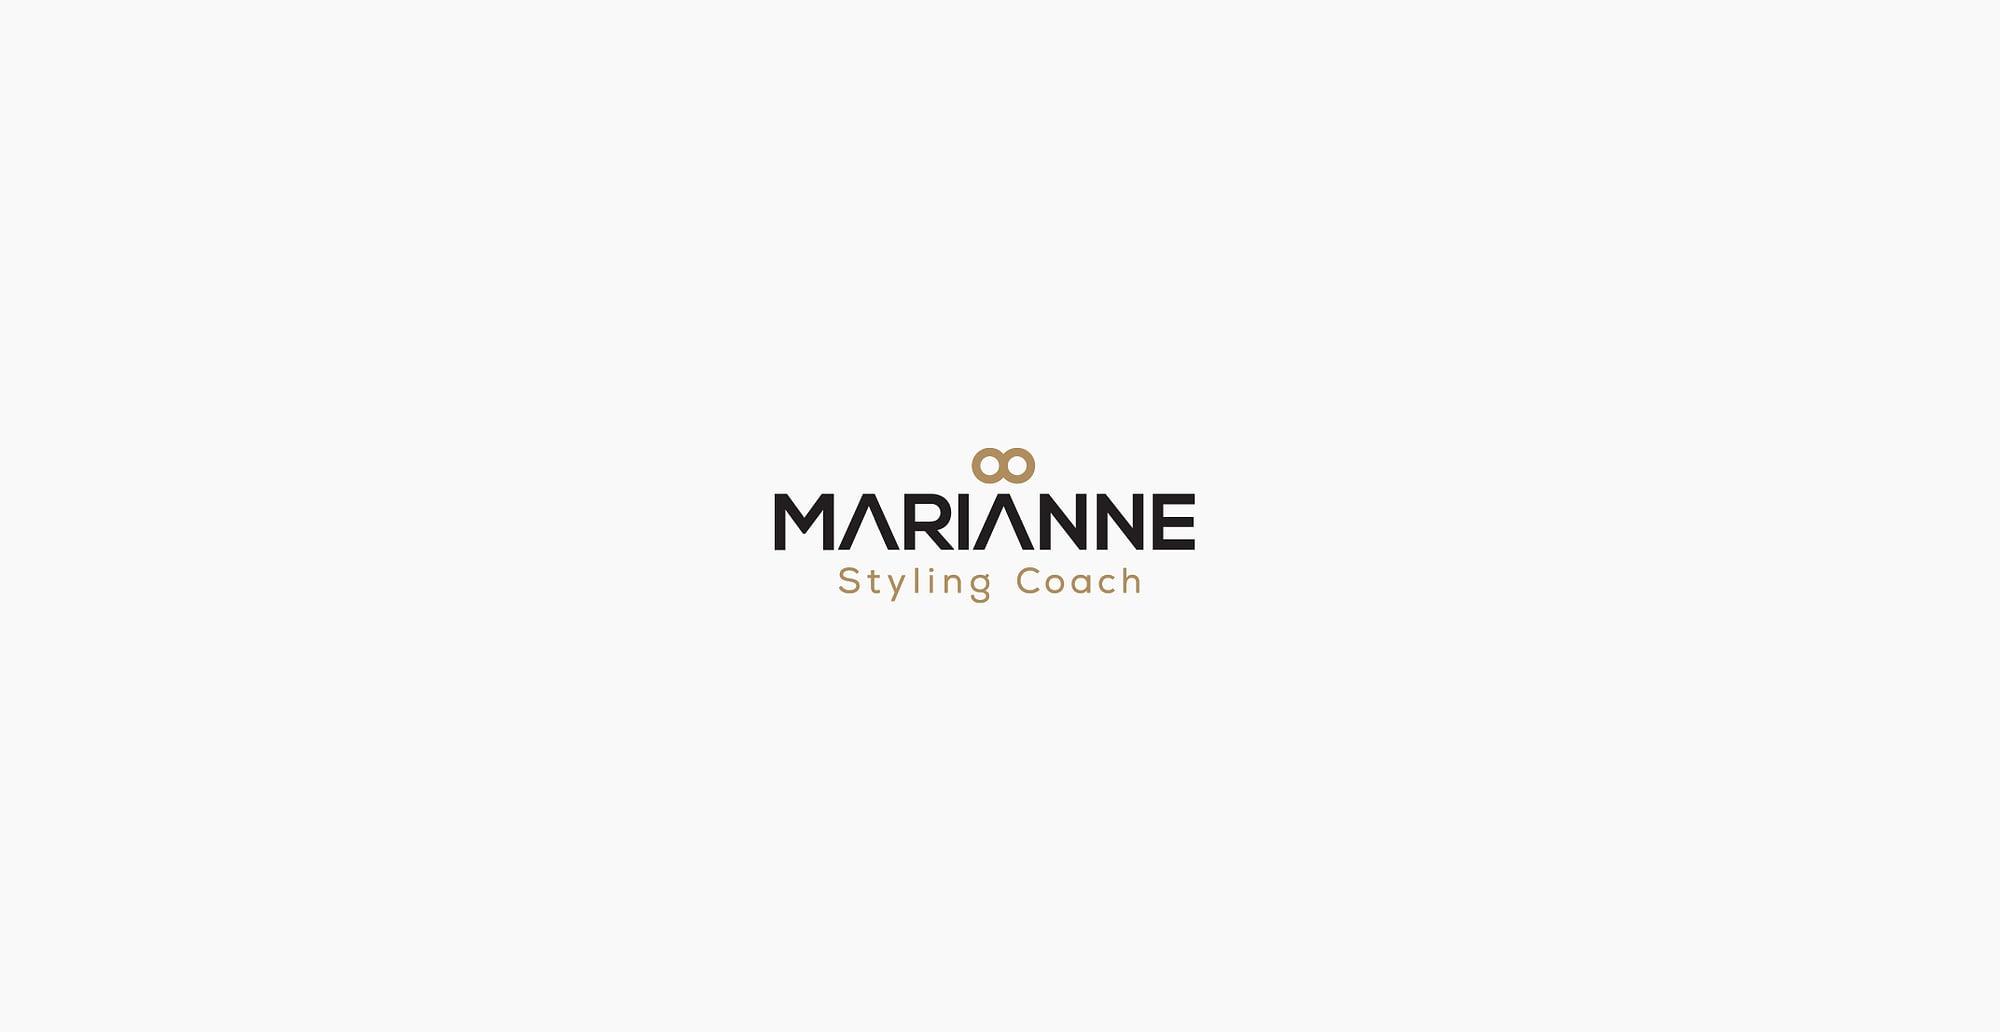 Logo designe for Marianne